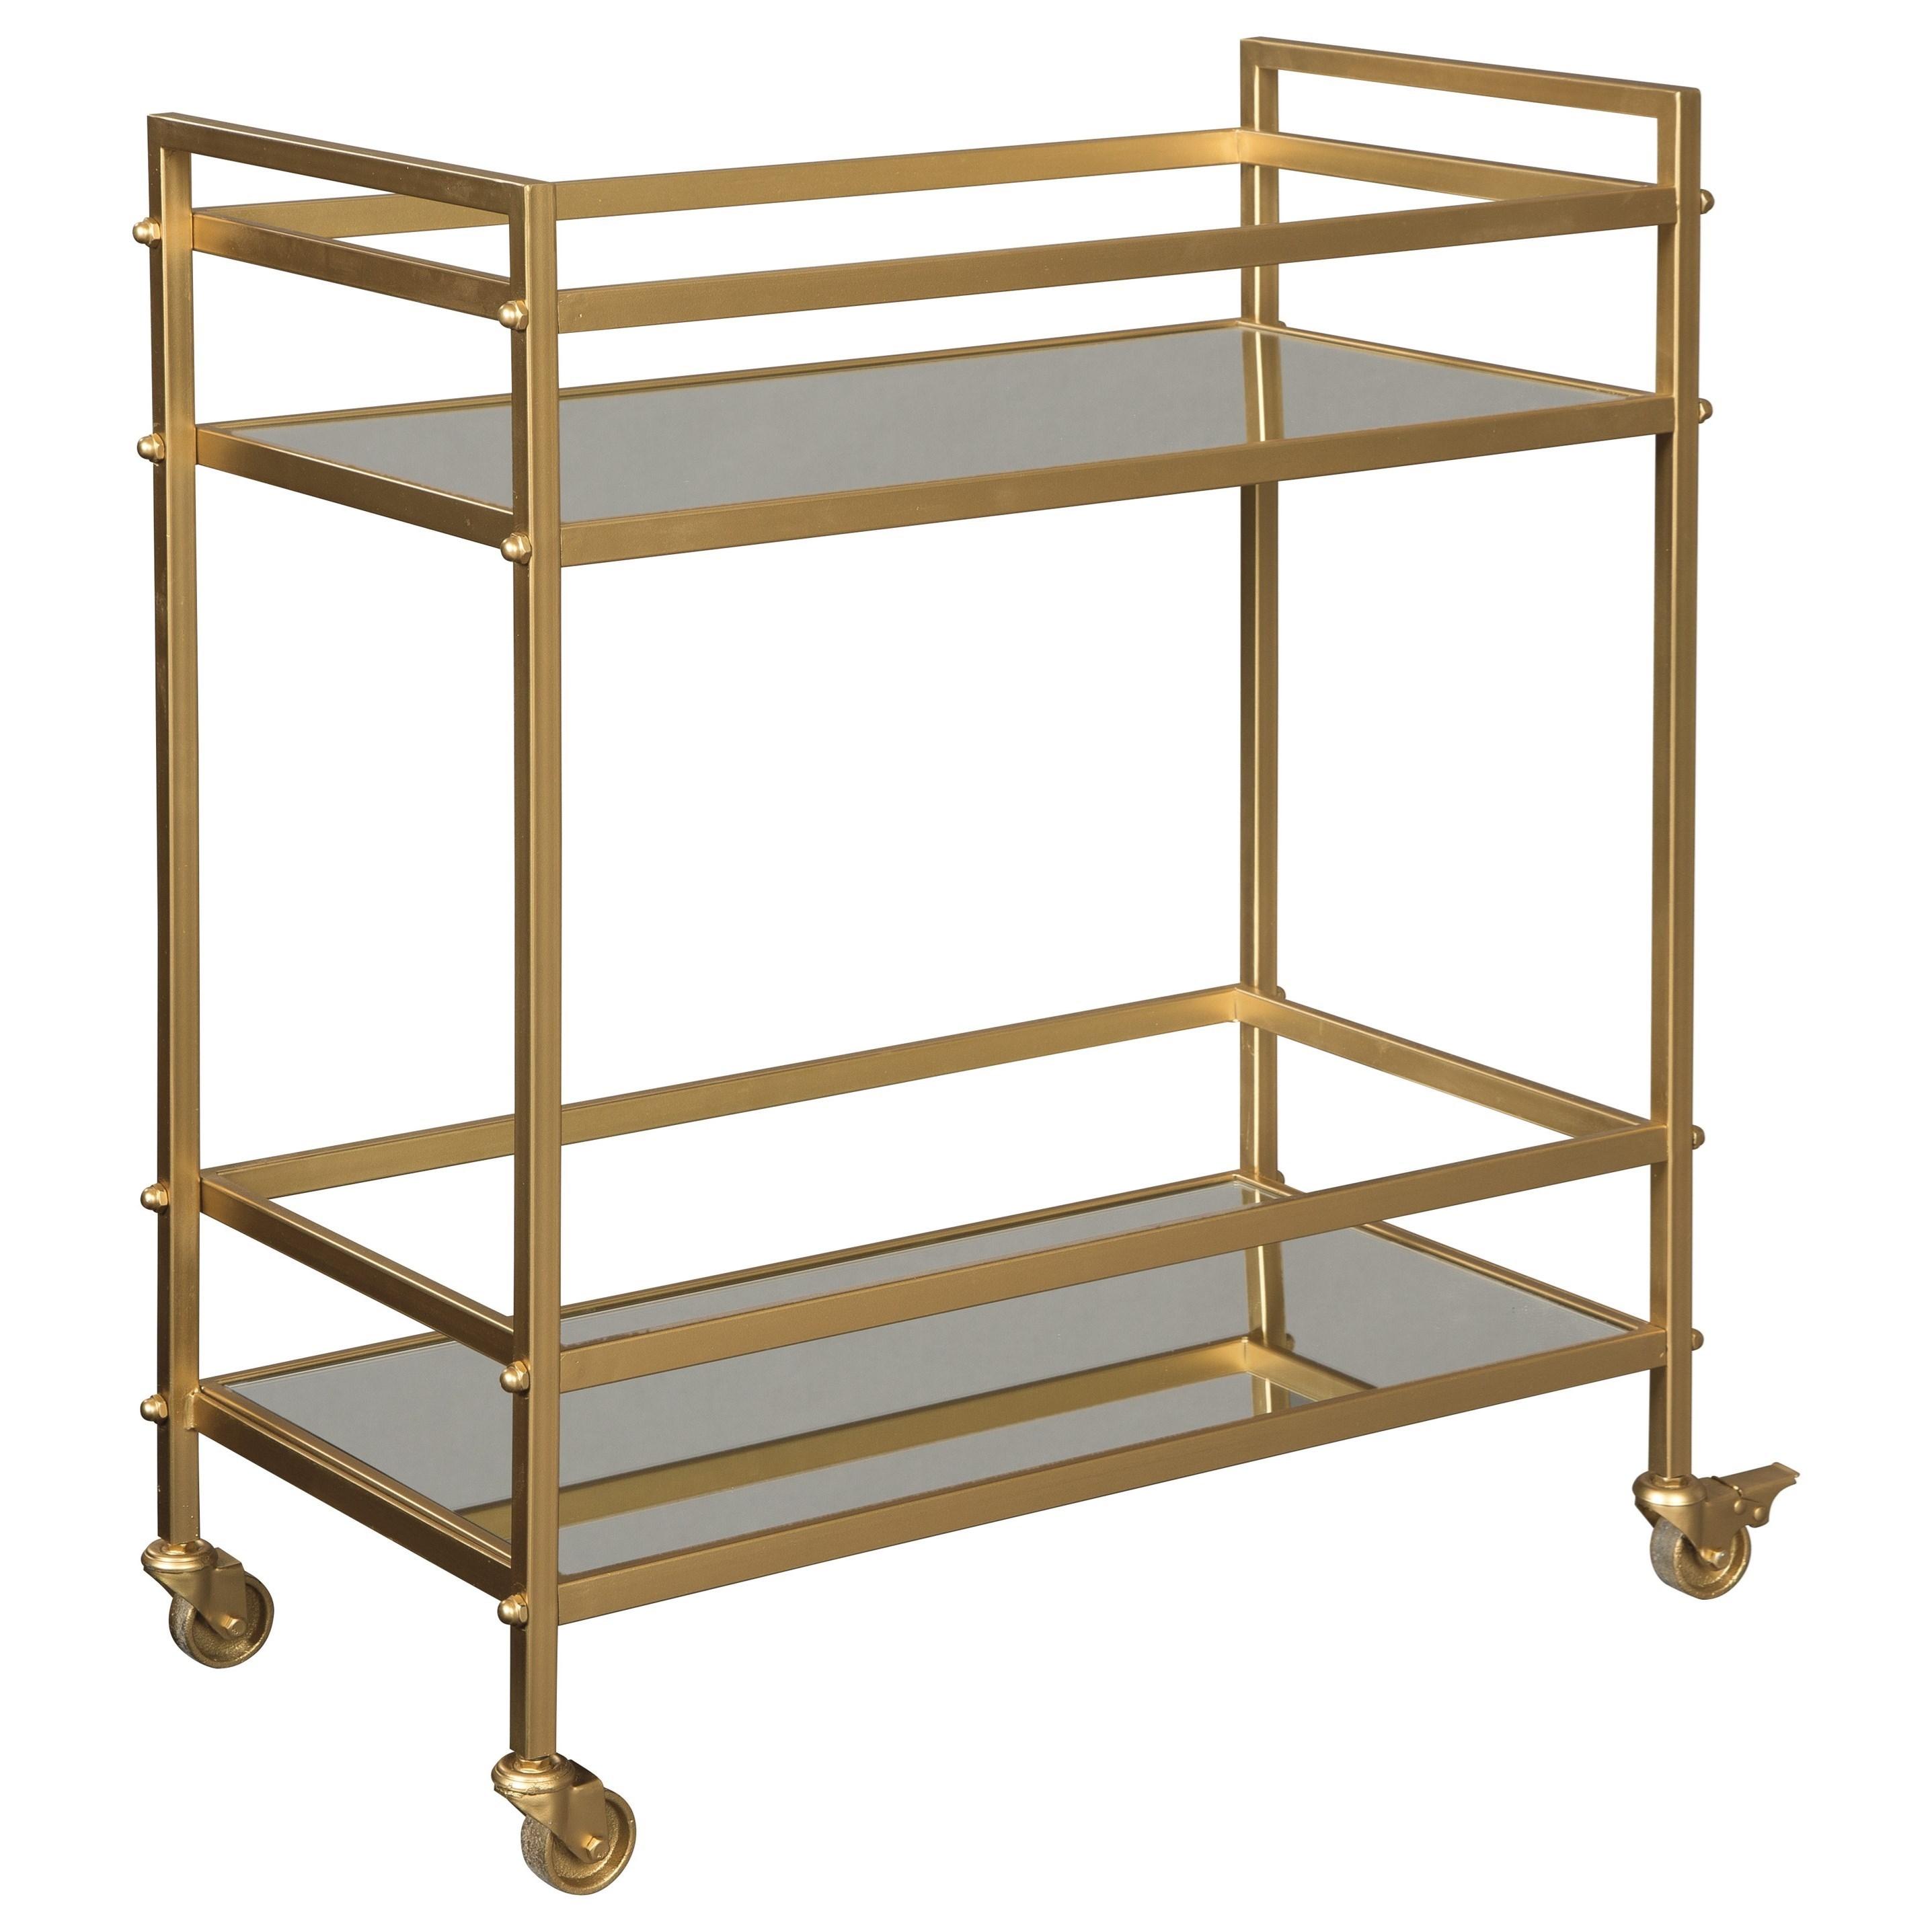 Kailman Bar Cart by Signature Design by Ashley at HomeWorld Furniture